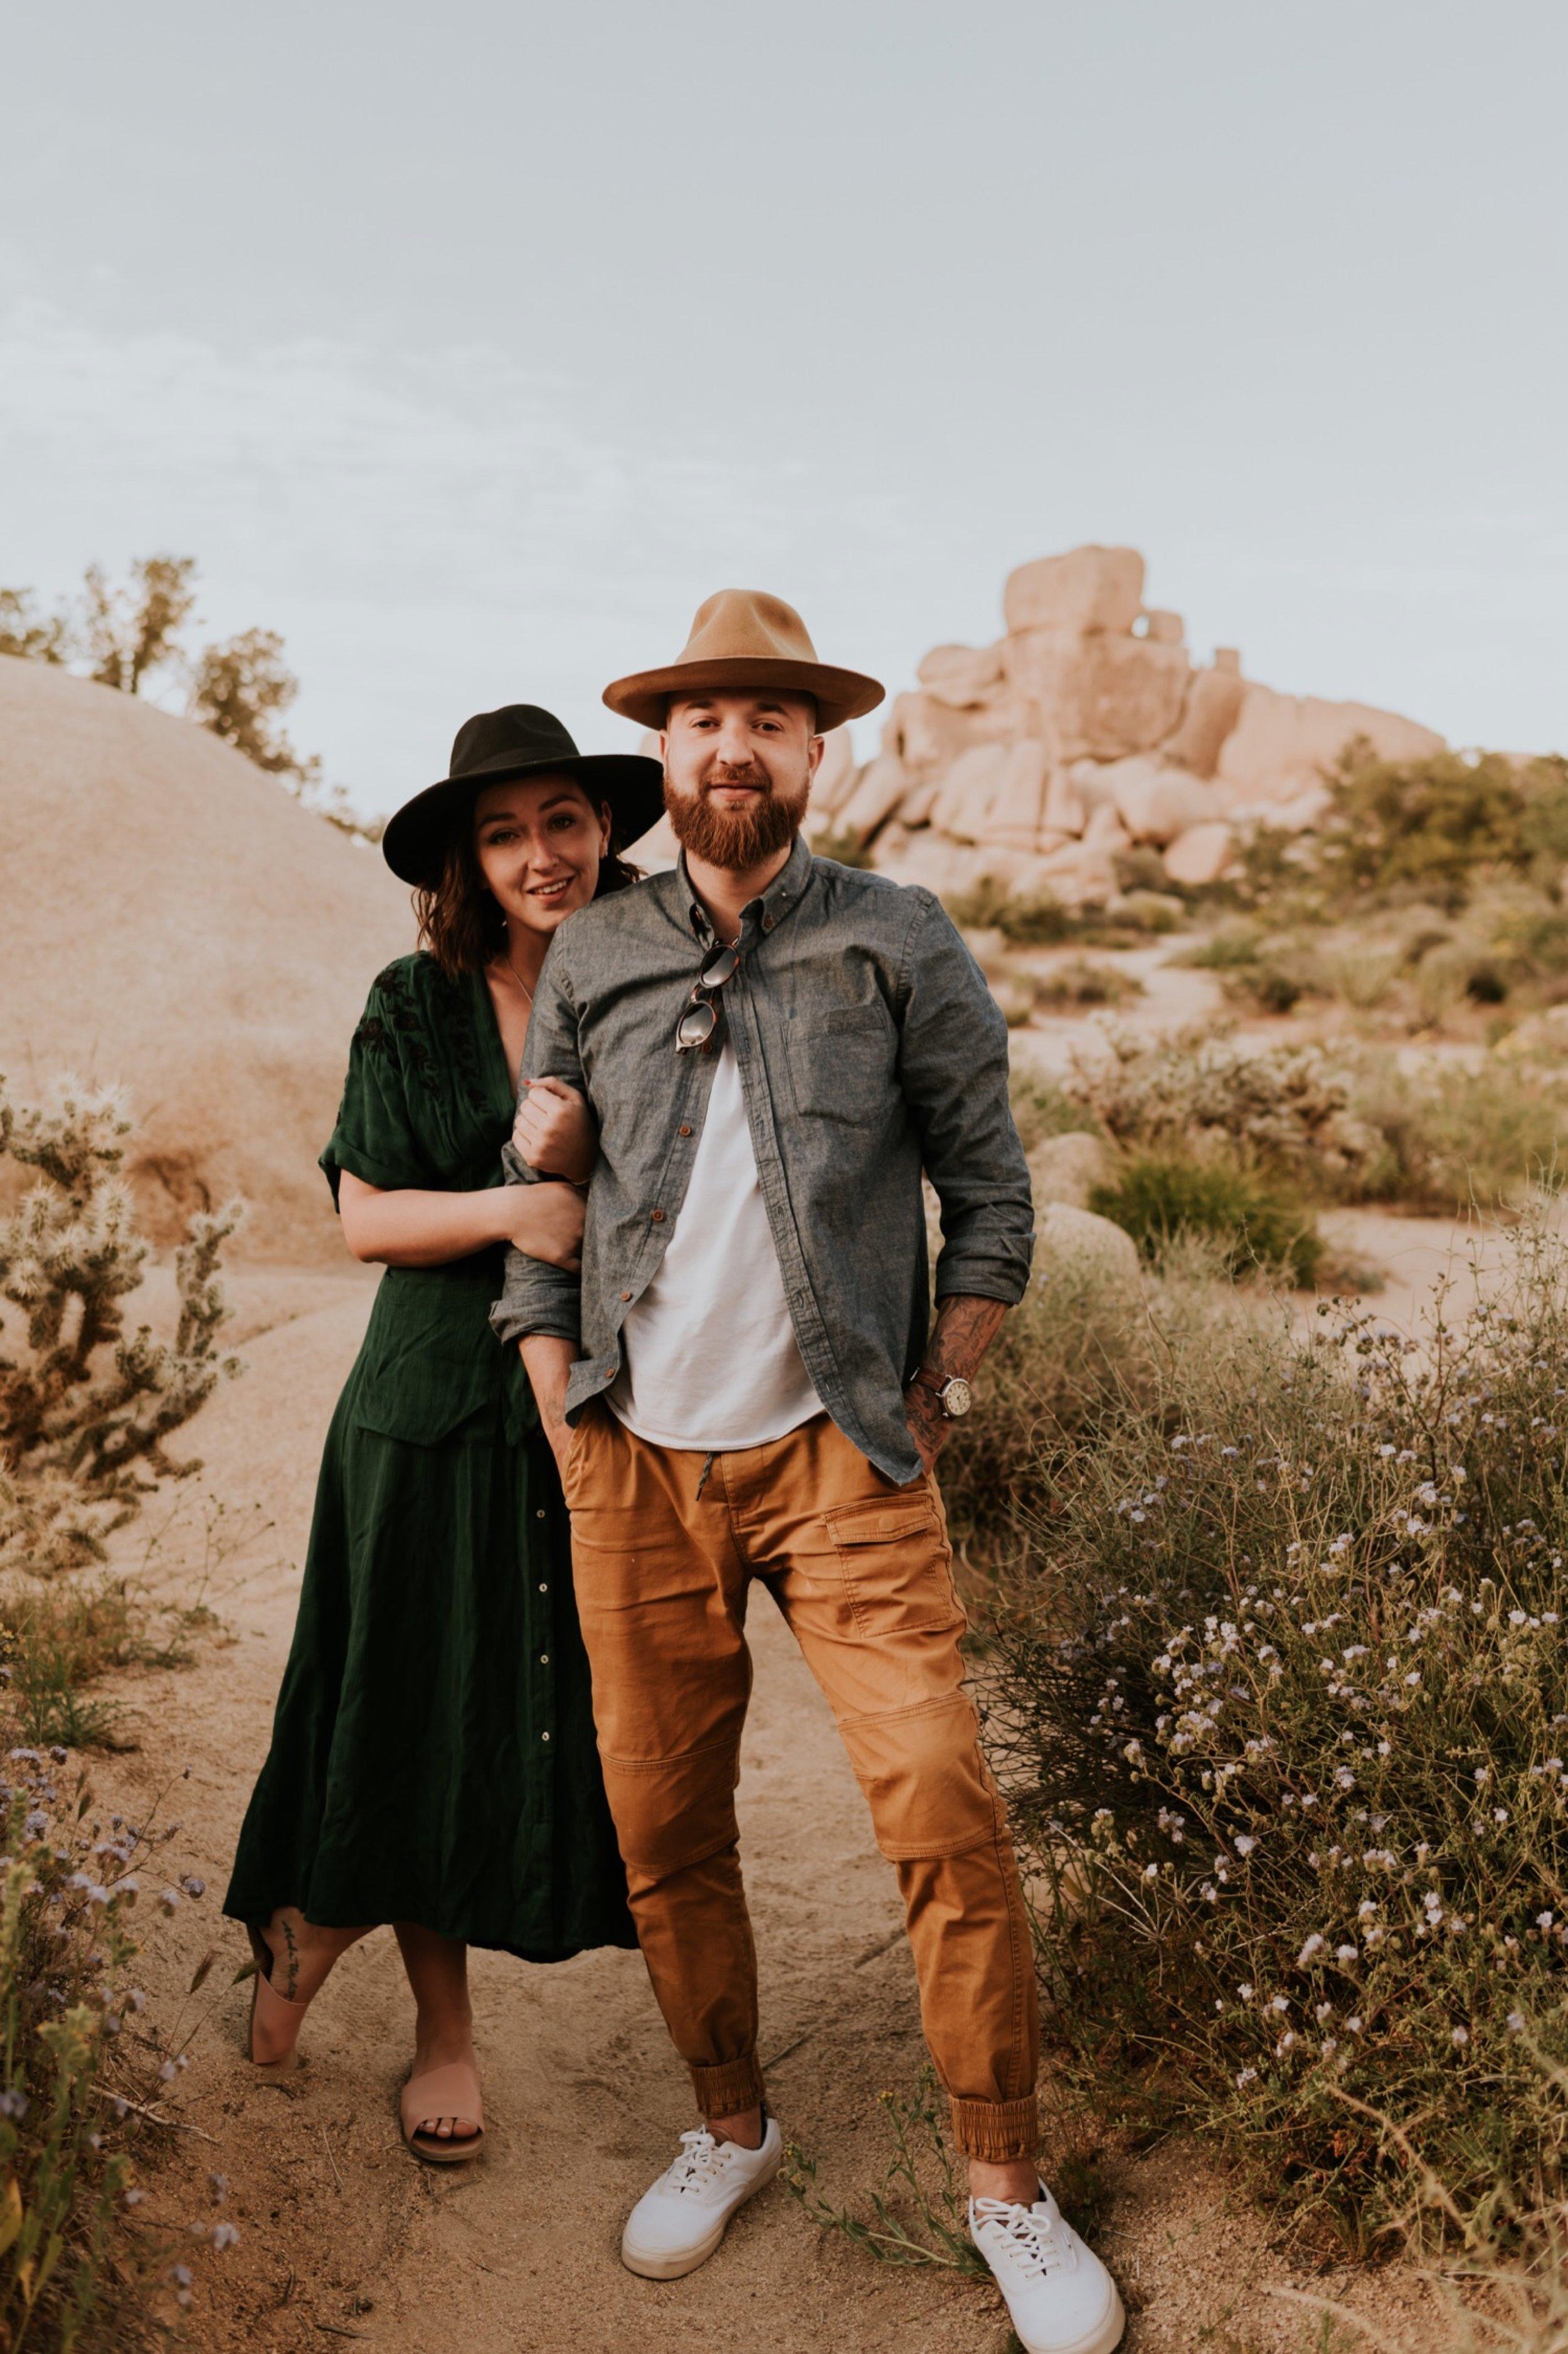 Couples Photoshoot In Joshua Tree National Park